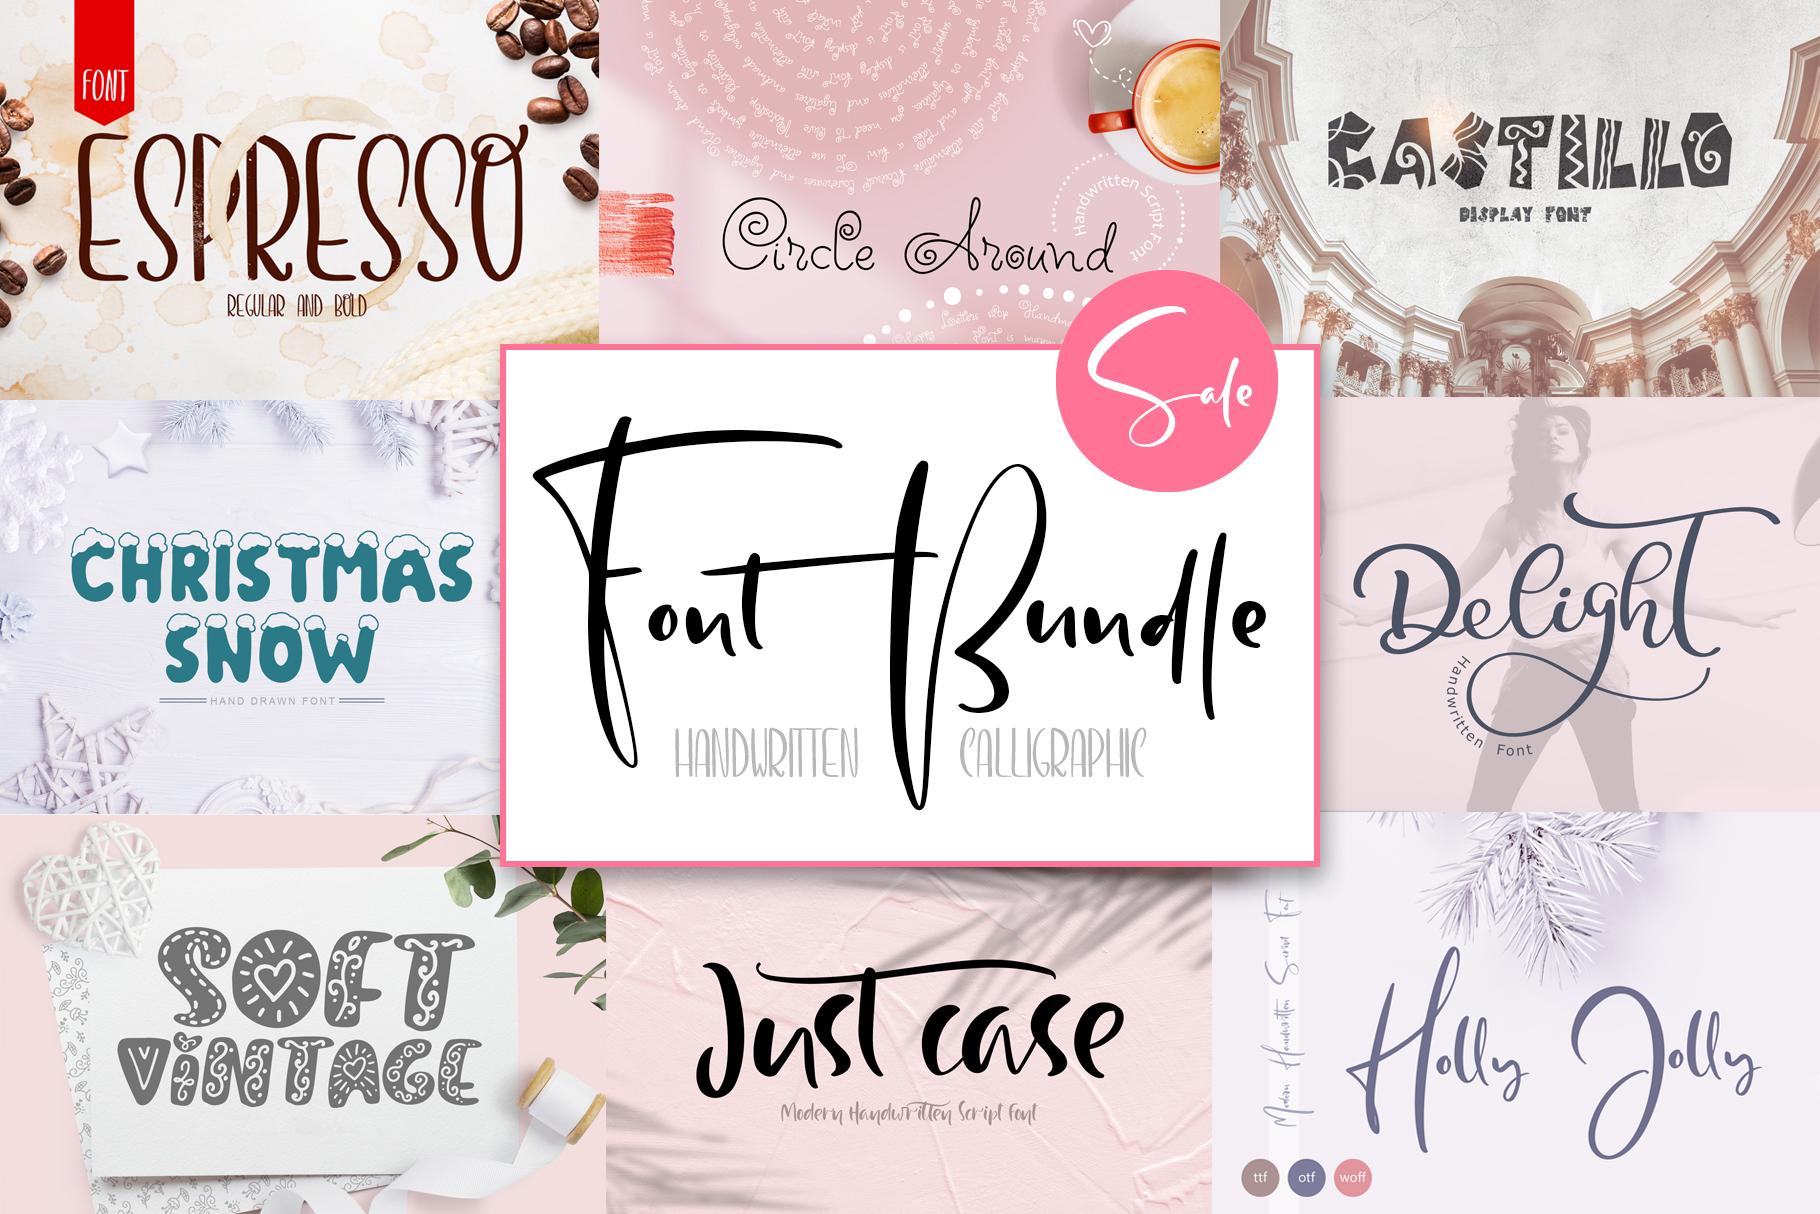 Font Bundle Handwritten Calligraphic example image 1